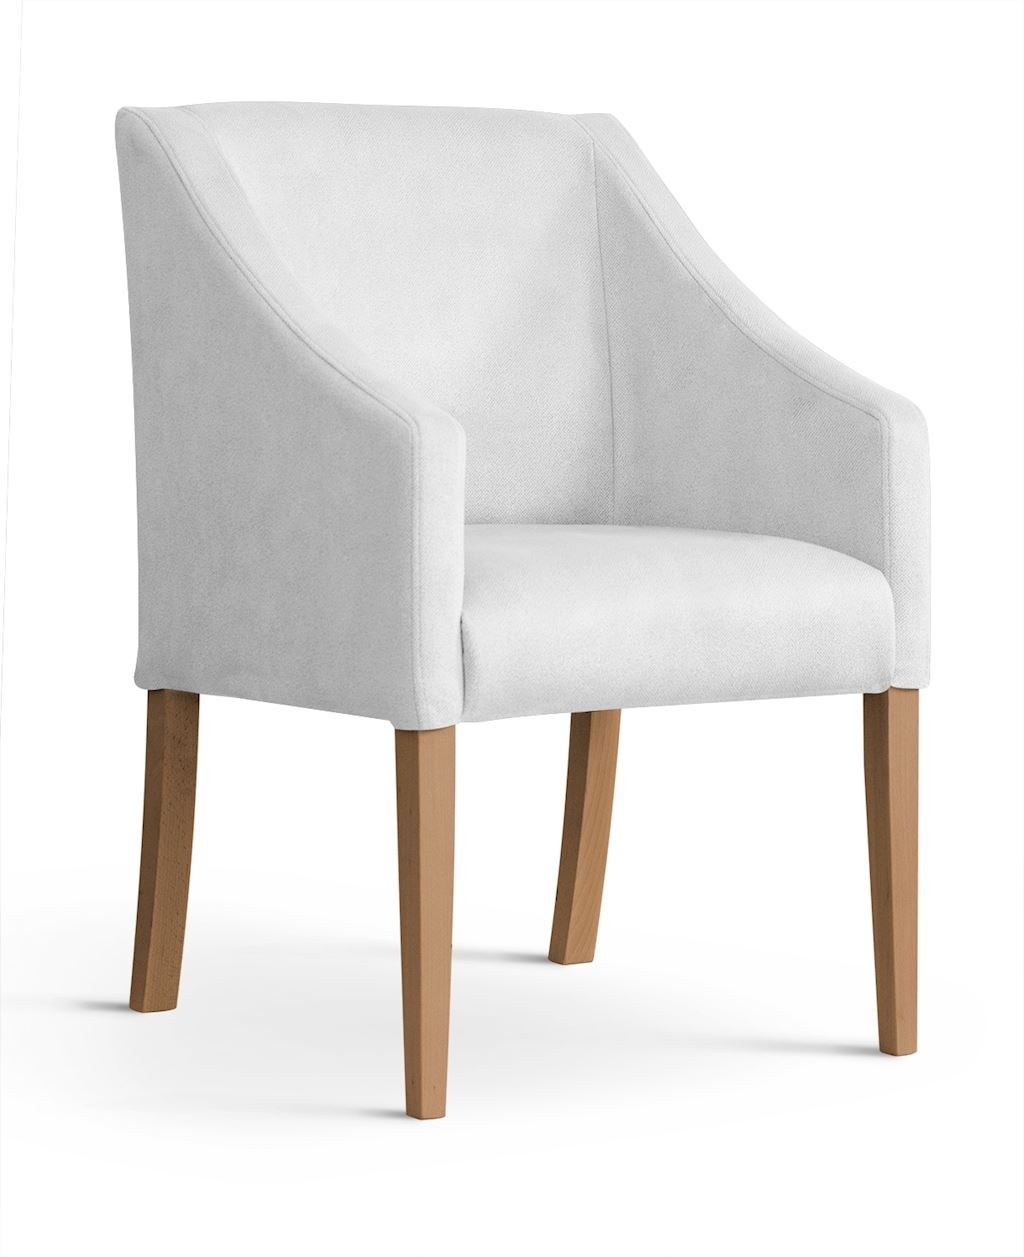 Fotoliu fix tapitat cu stofa, cu picioare din lemn Capri Silver / Oak, l58xA60xH89 cm imagine